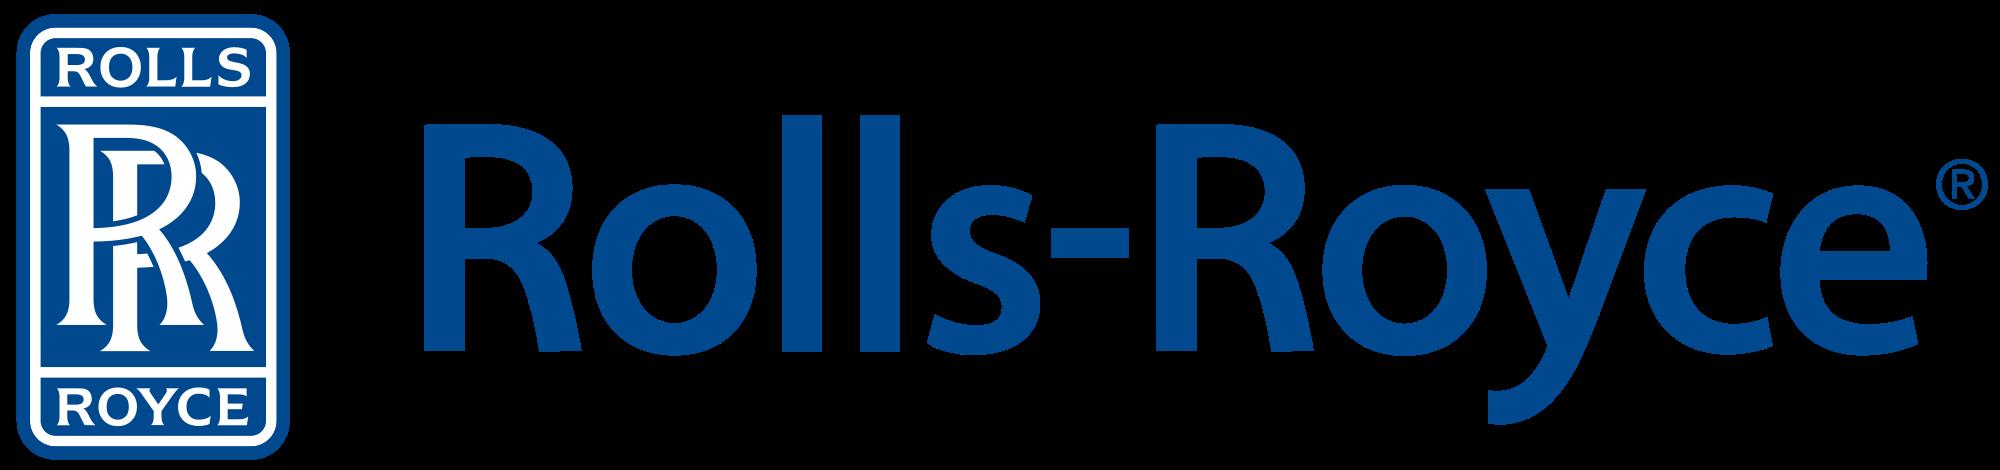 Rolls-royce-logo-png.png